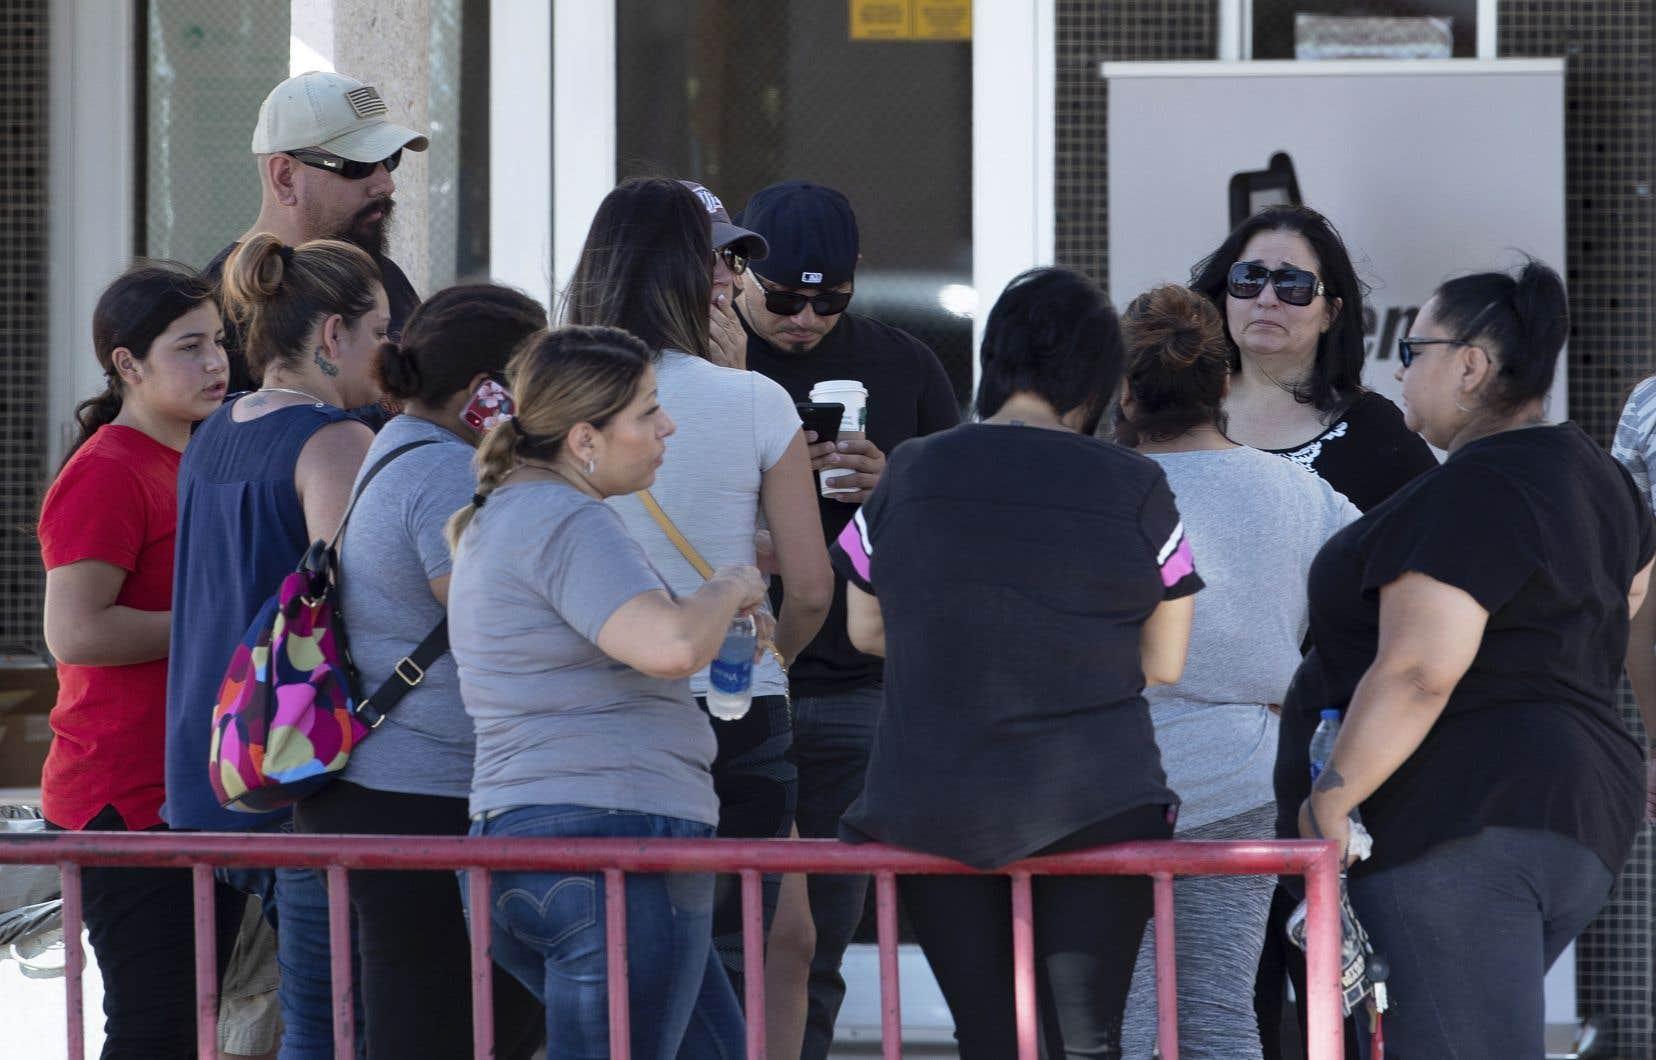 Des proches des victimes de la fusillade au Walmart d'El Paso